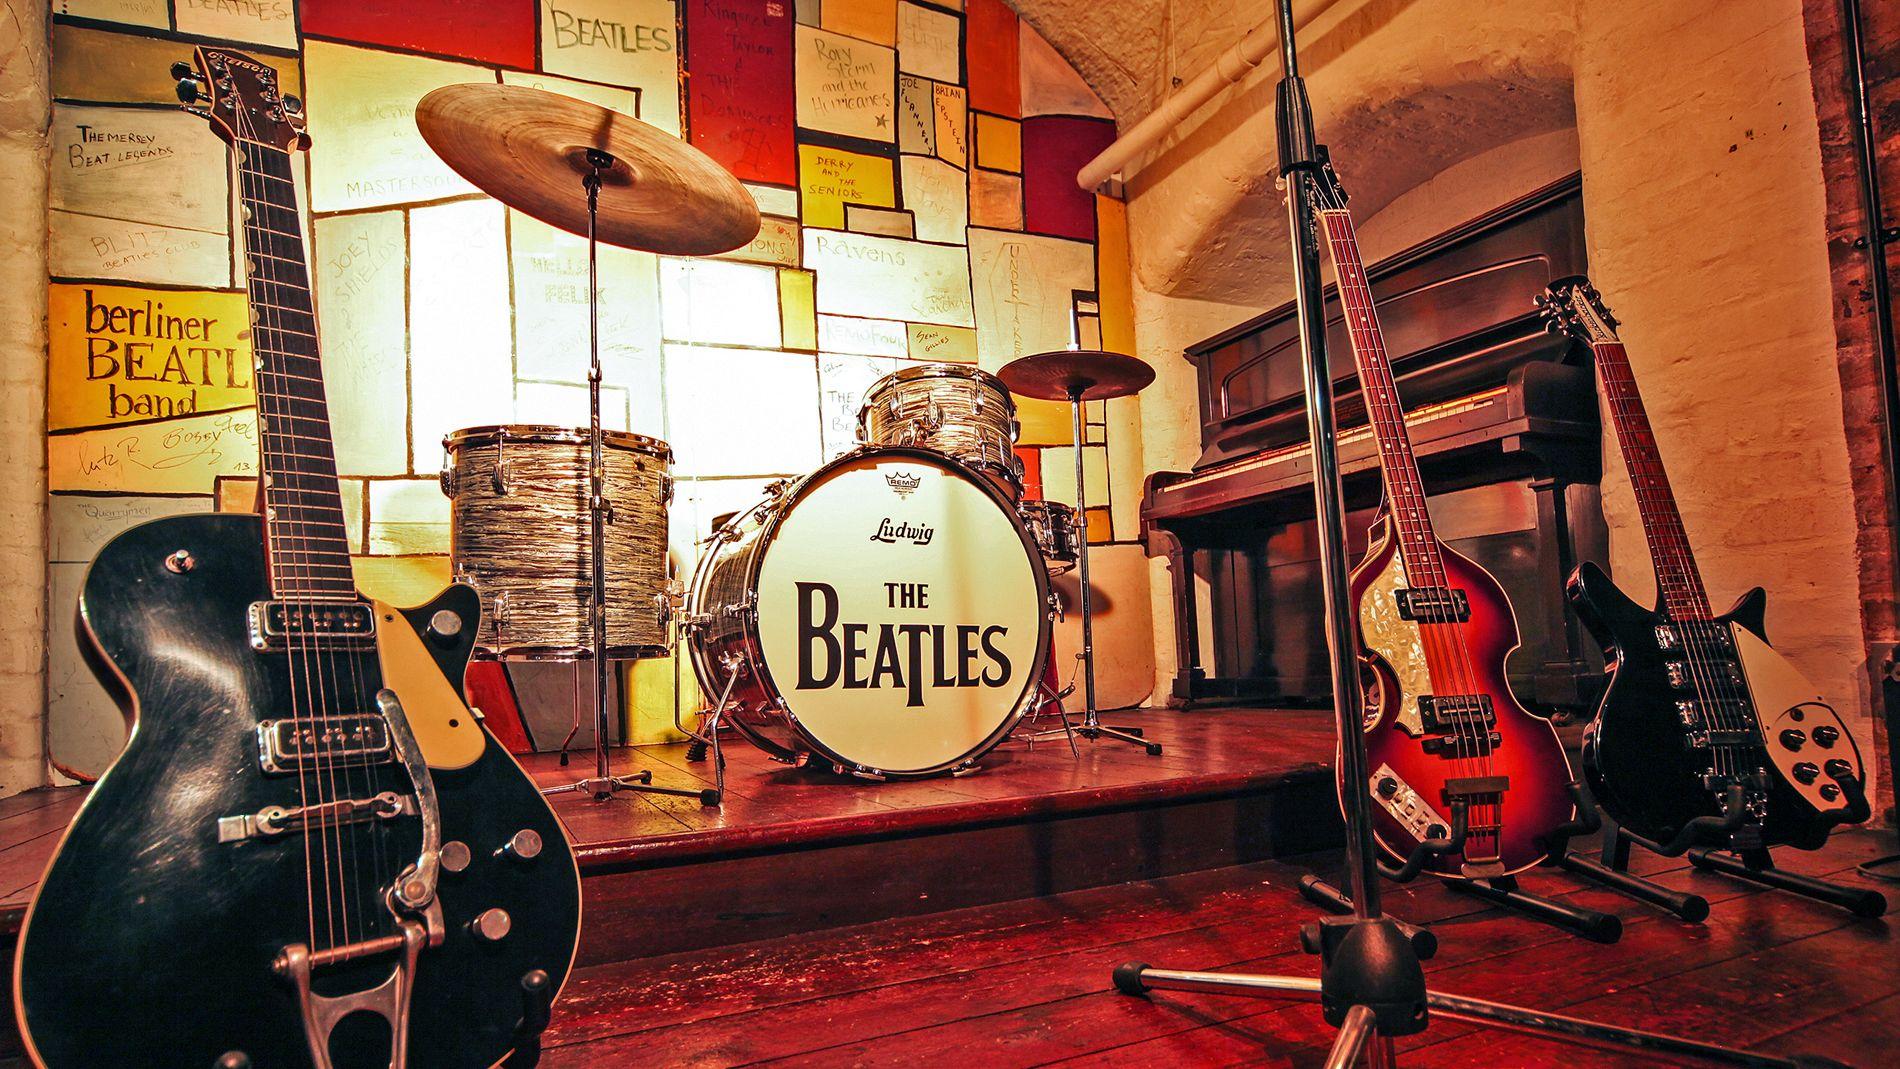 Beatles band set up